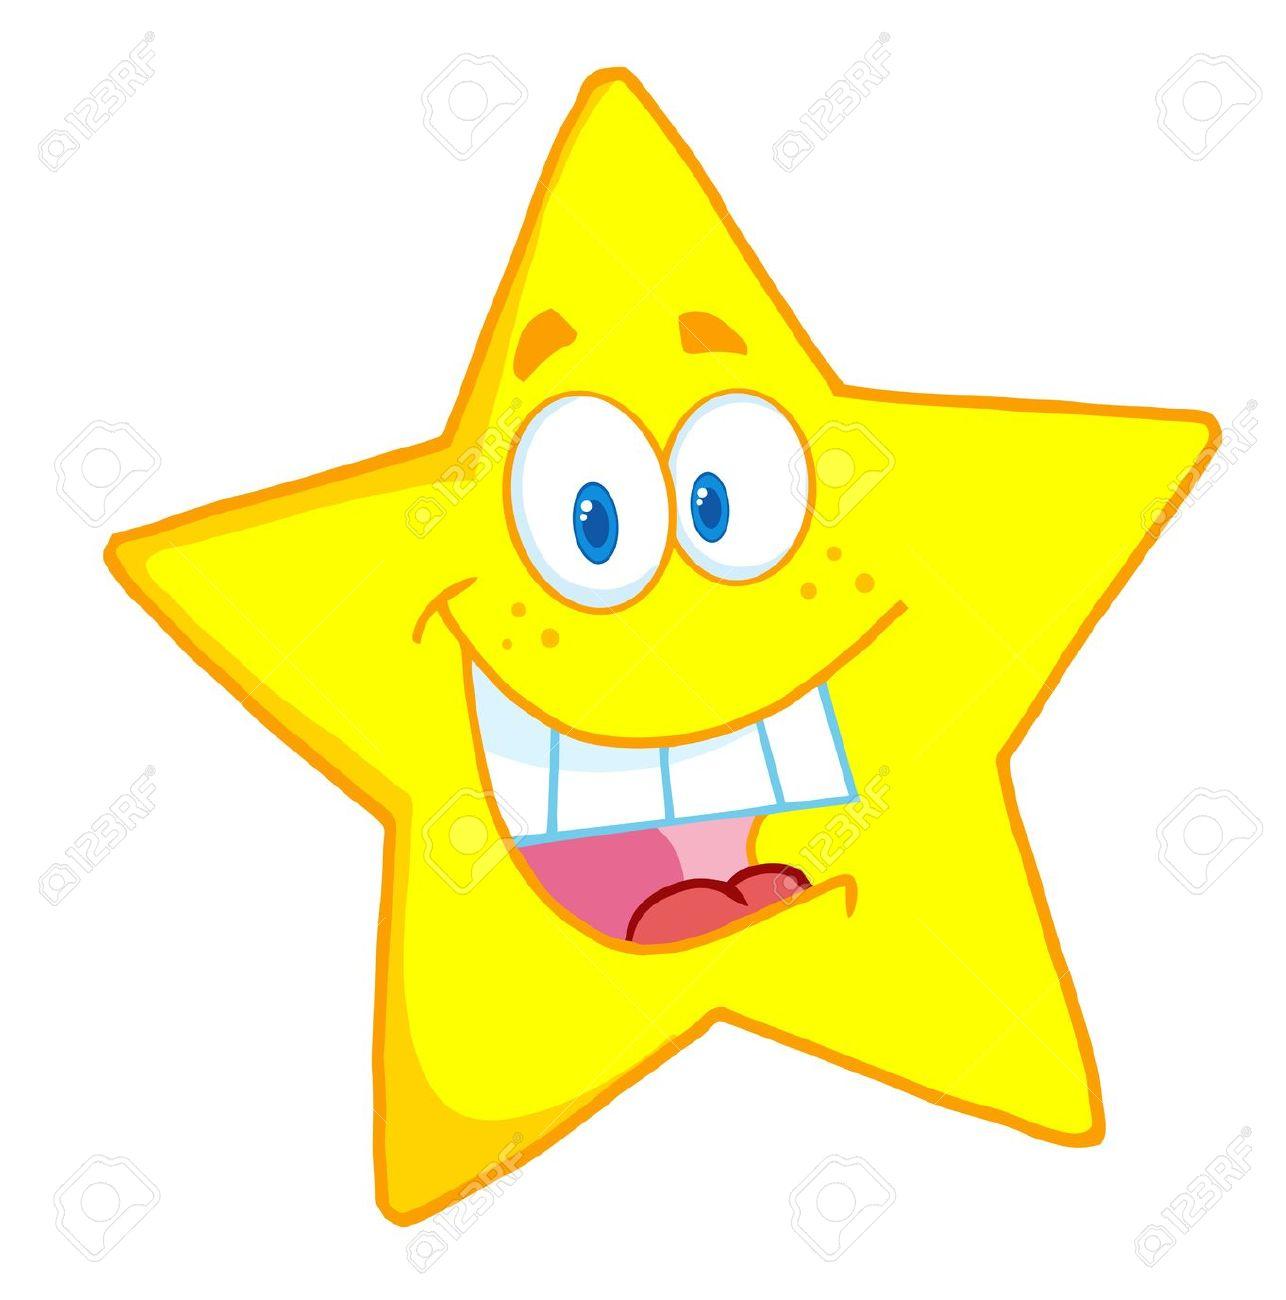 Cute star clipart vector.